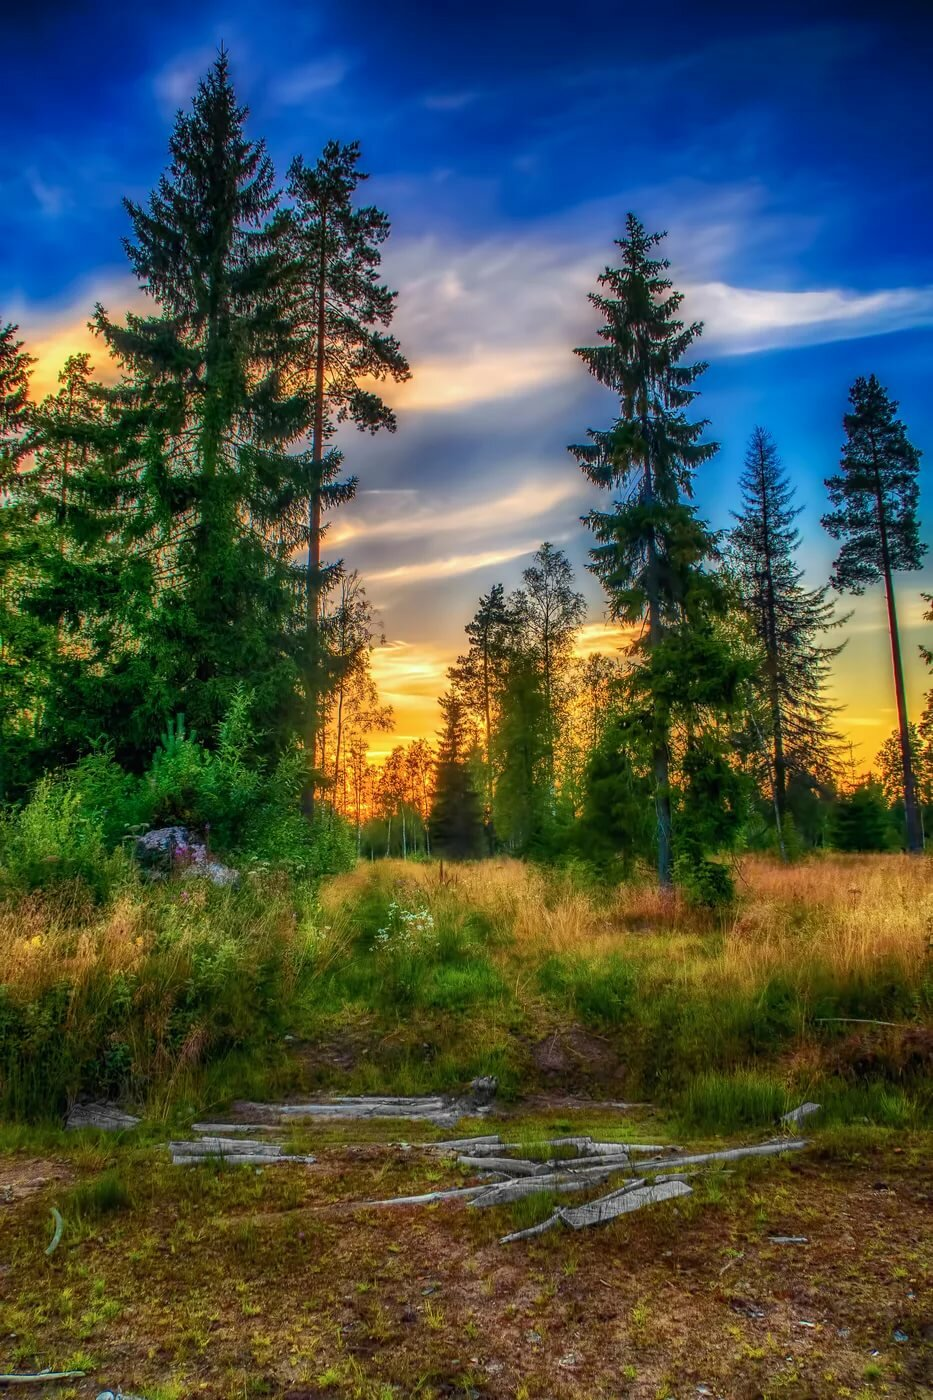 ресторане картинка красивого заката в лесу вас интересуют